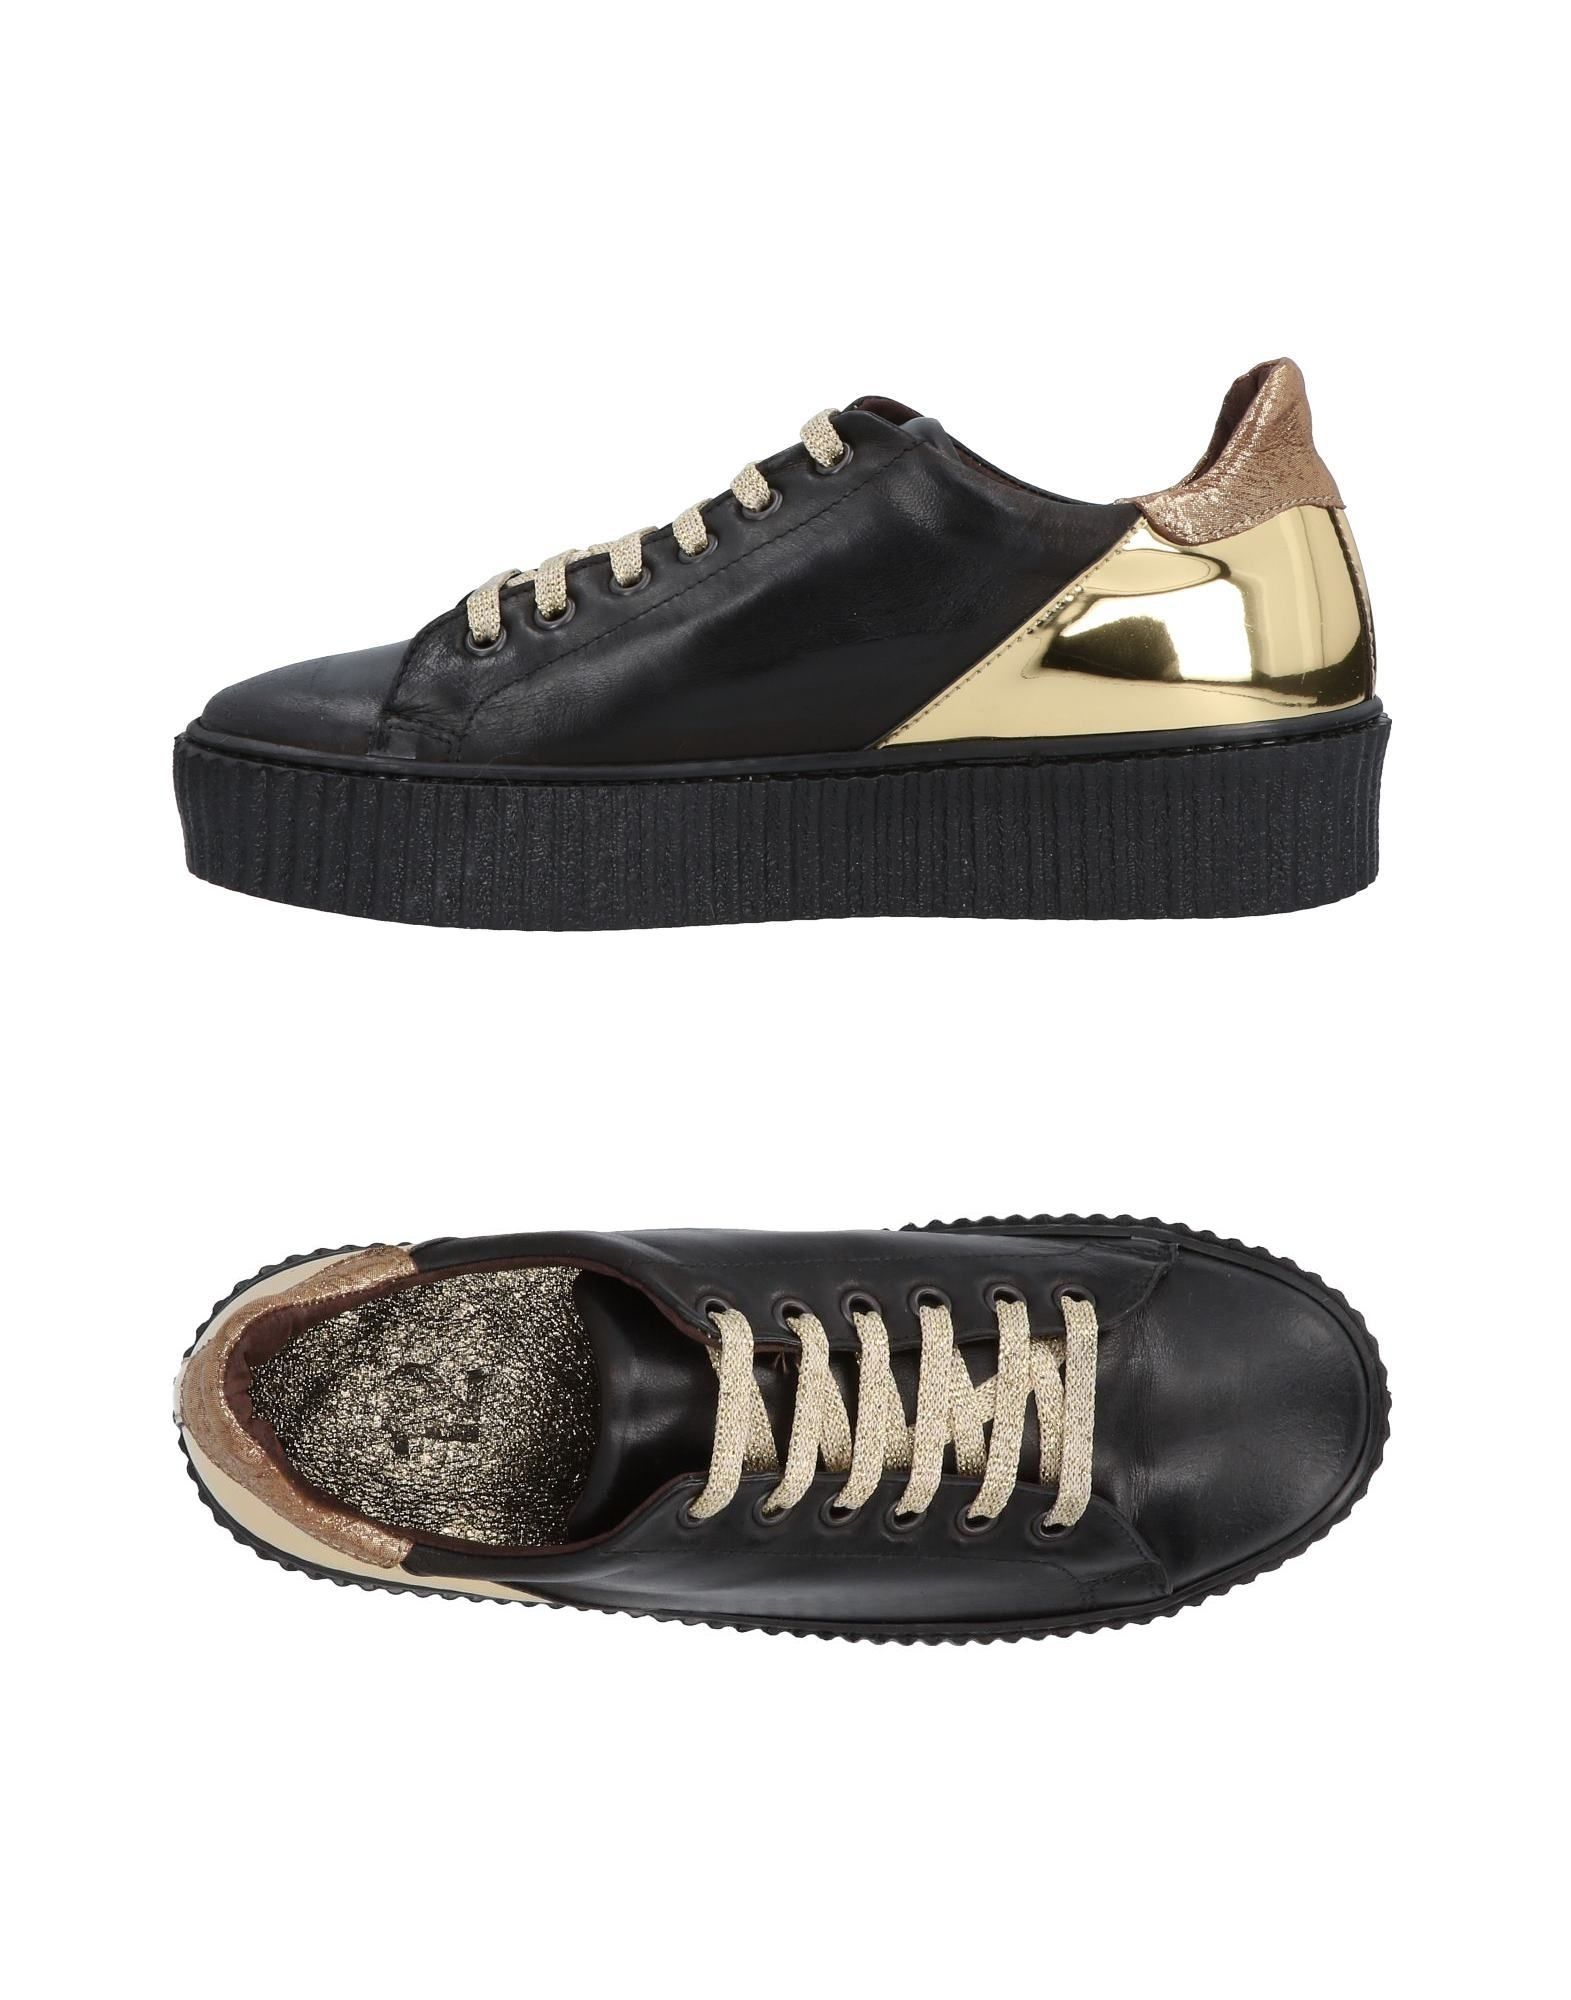 Zapatillas Tsd12 Mujer Mujer Tsd12 - Zapatillas Tsd12  Negro 2139cc